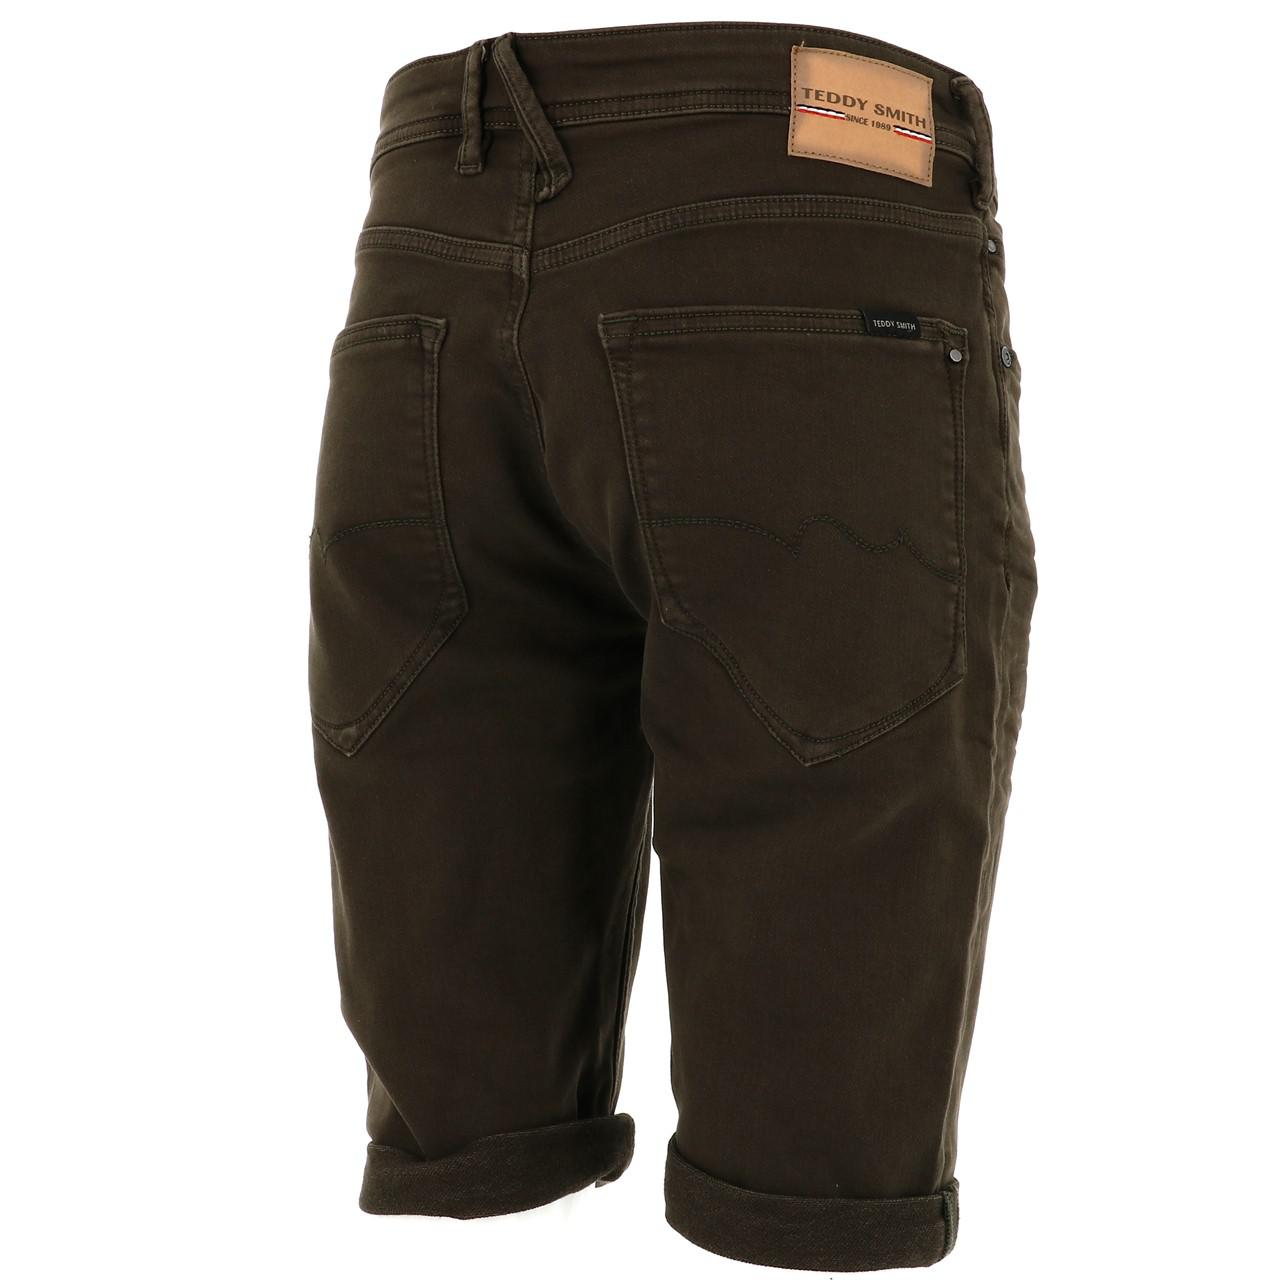 Bermuda-Shorts-Teddy-Smith-Scotty-3-Middl-Khaki-Shorts-Green-18133-New thumbnail 5